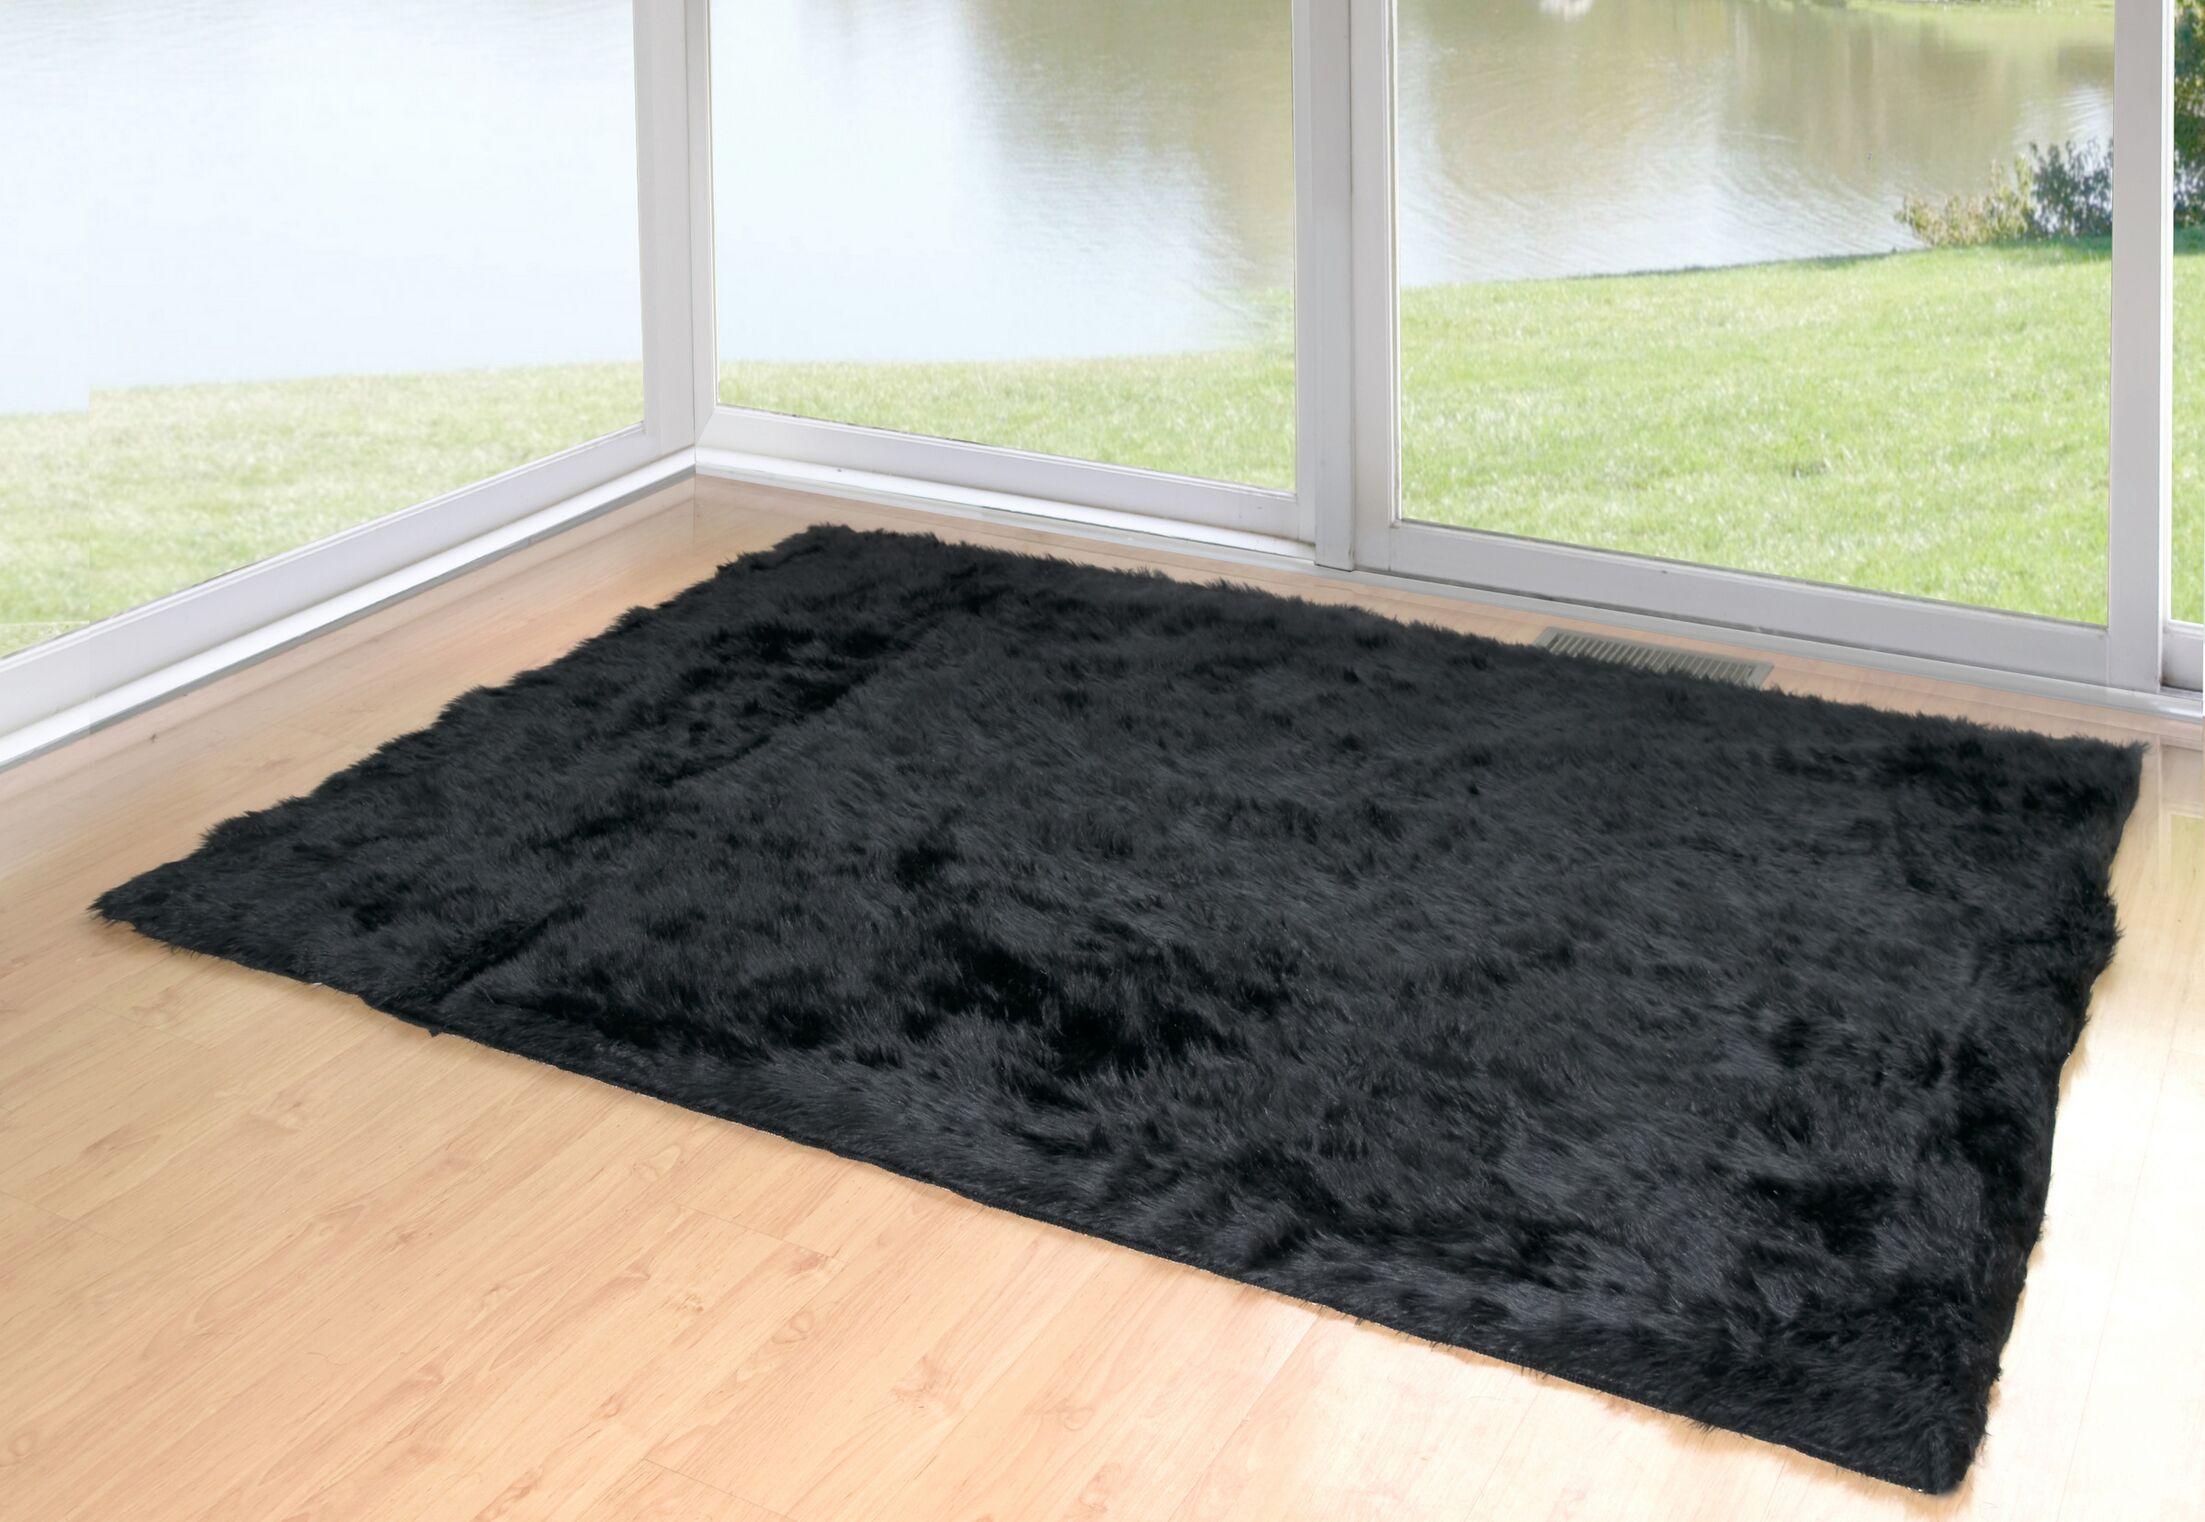 Anvi Faux Fur Black Area Rug Rug Size: Rectangle 5' x 8'